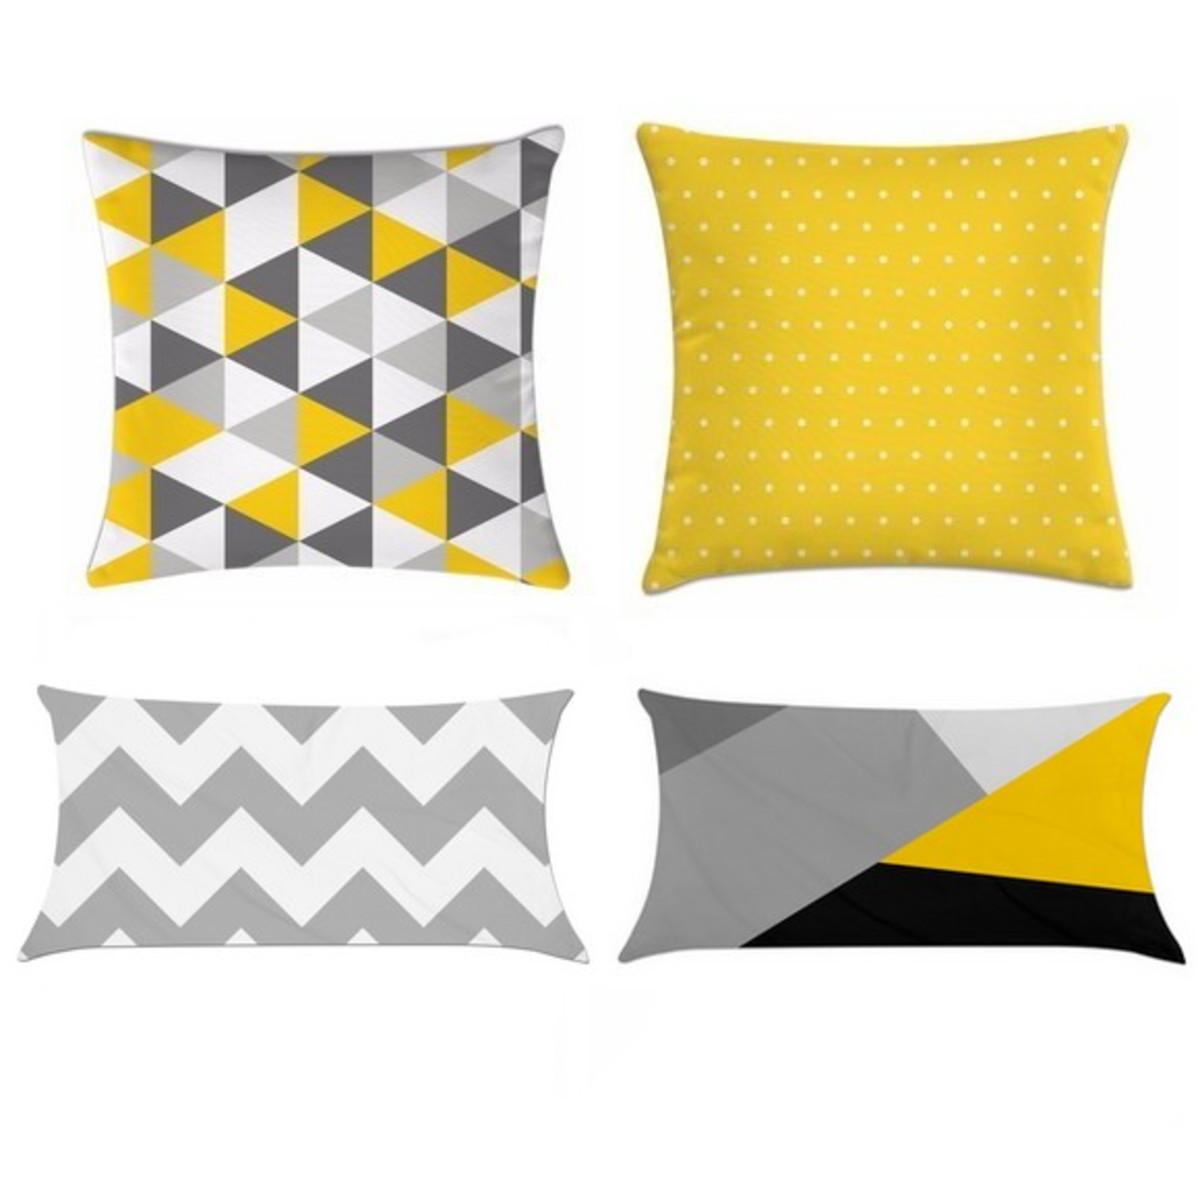 5cd9cd5c2528aa Kit 4 Capas Almofadas Decorativa Cinza e amarelo